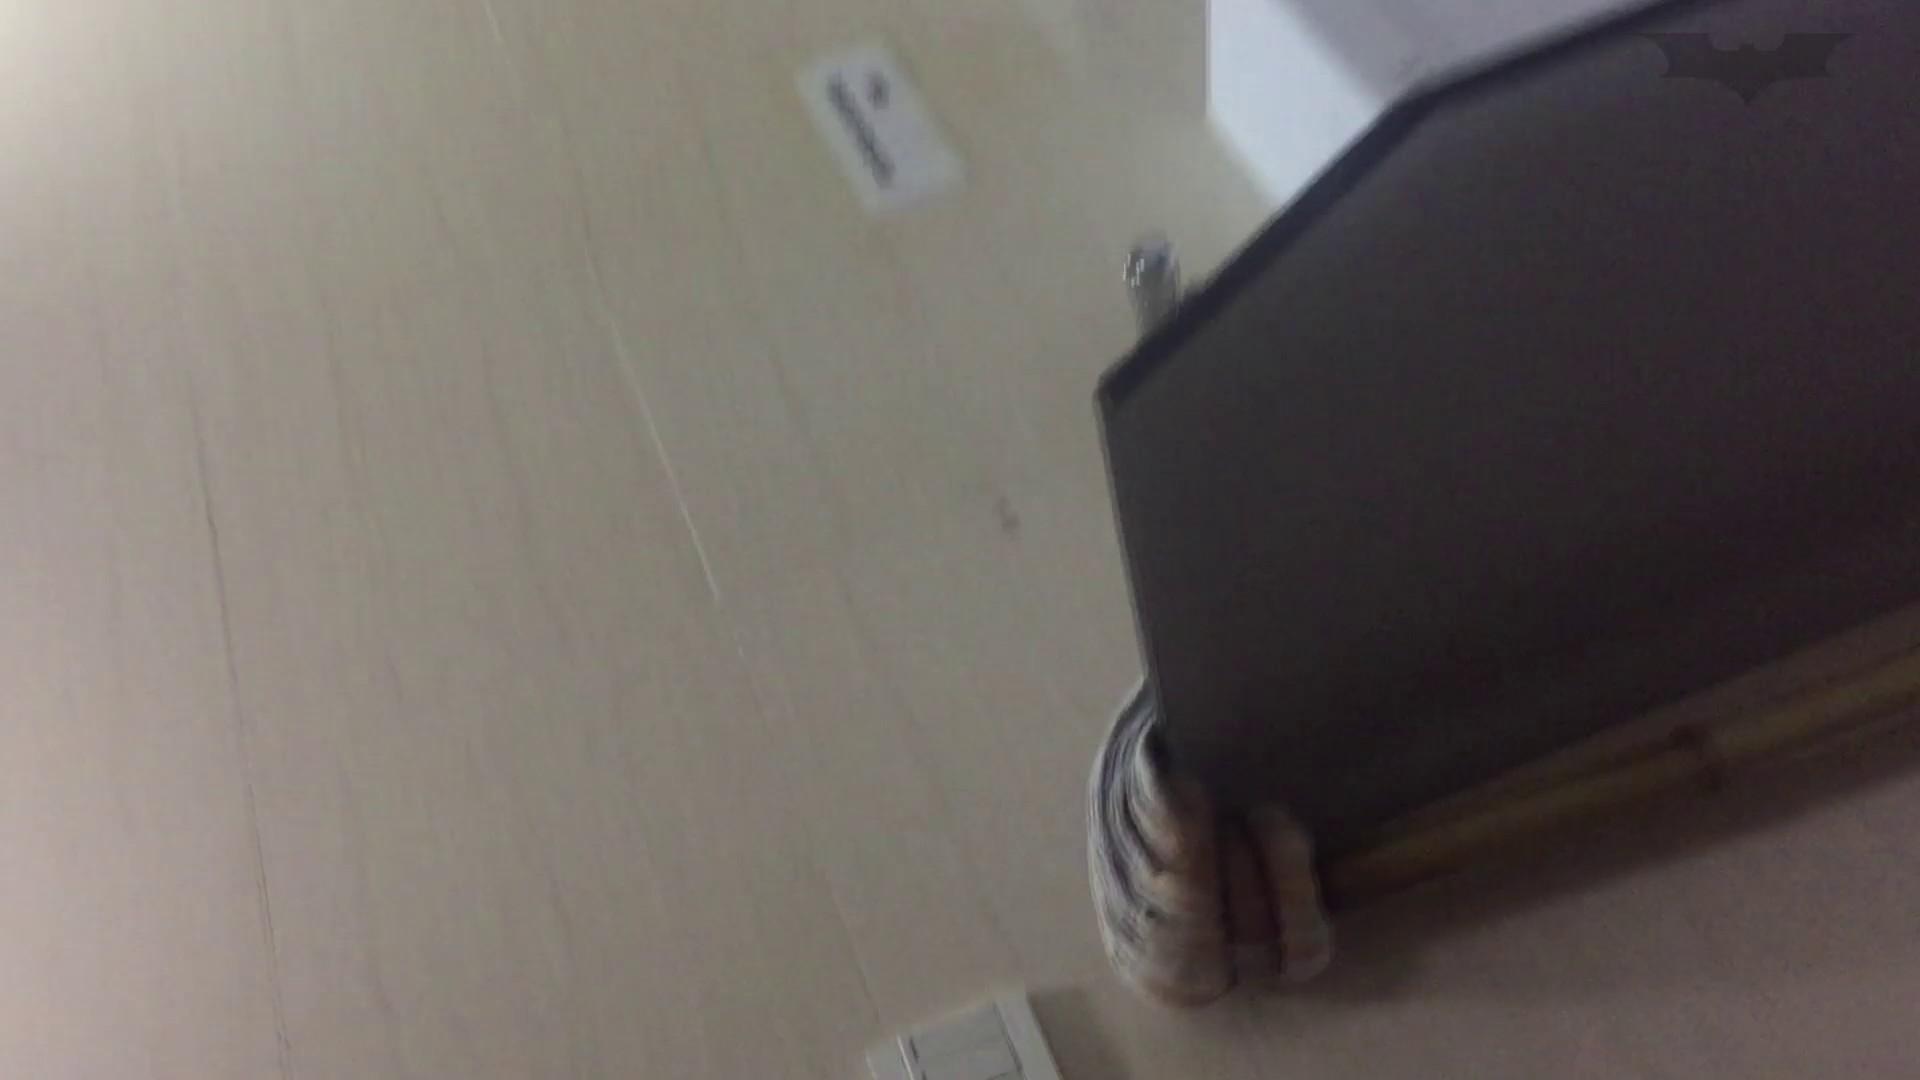 JD盗撮 美女の洗面所の秘密 Vol.70 ギャル達 オメコ無修正動画無料 110枚 46